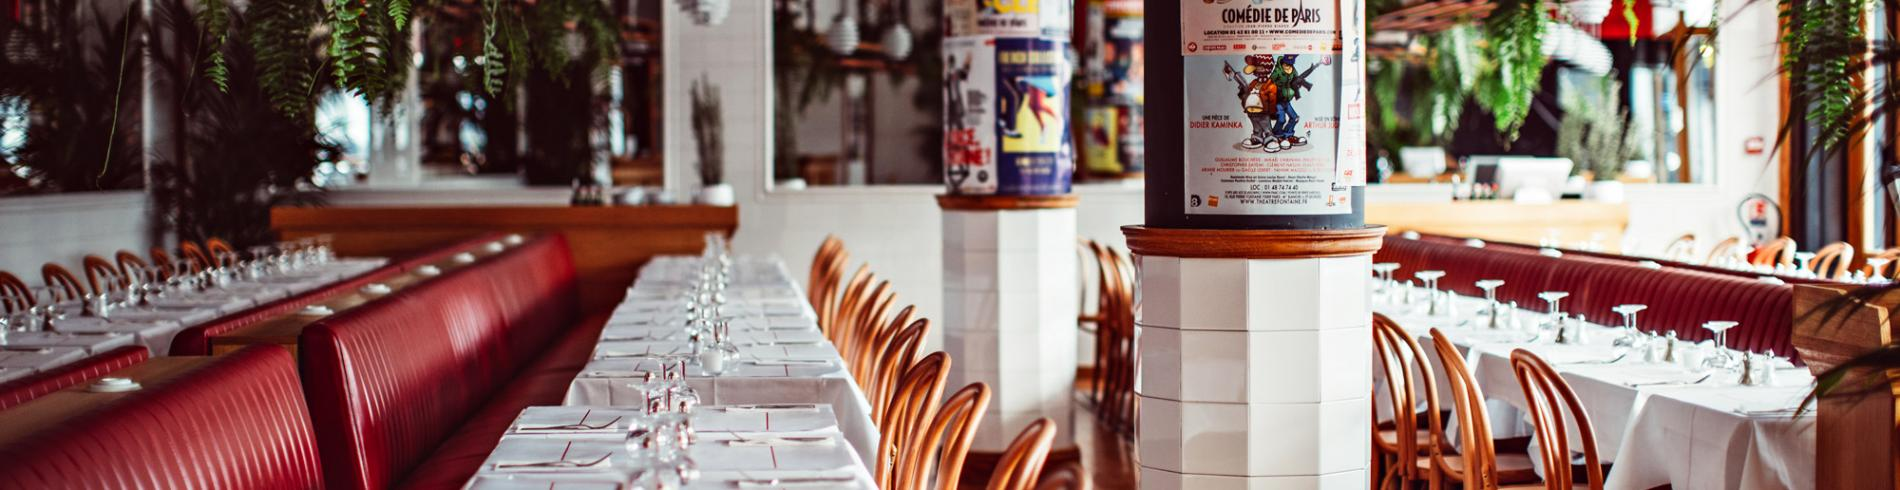 Interior shot of Bouillon restaurant